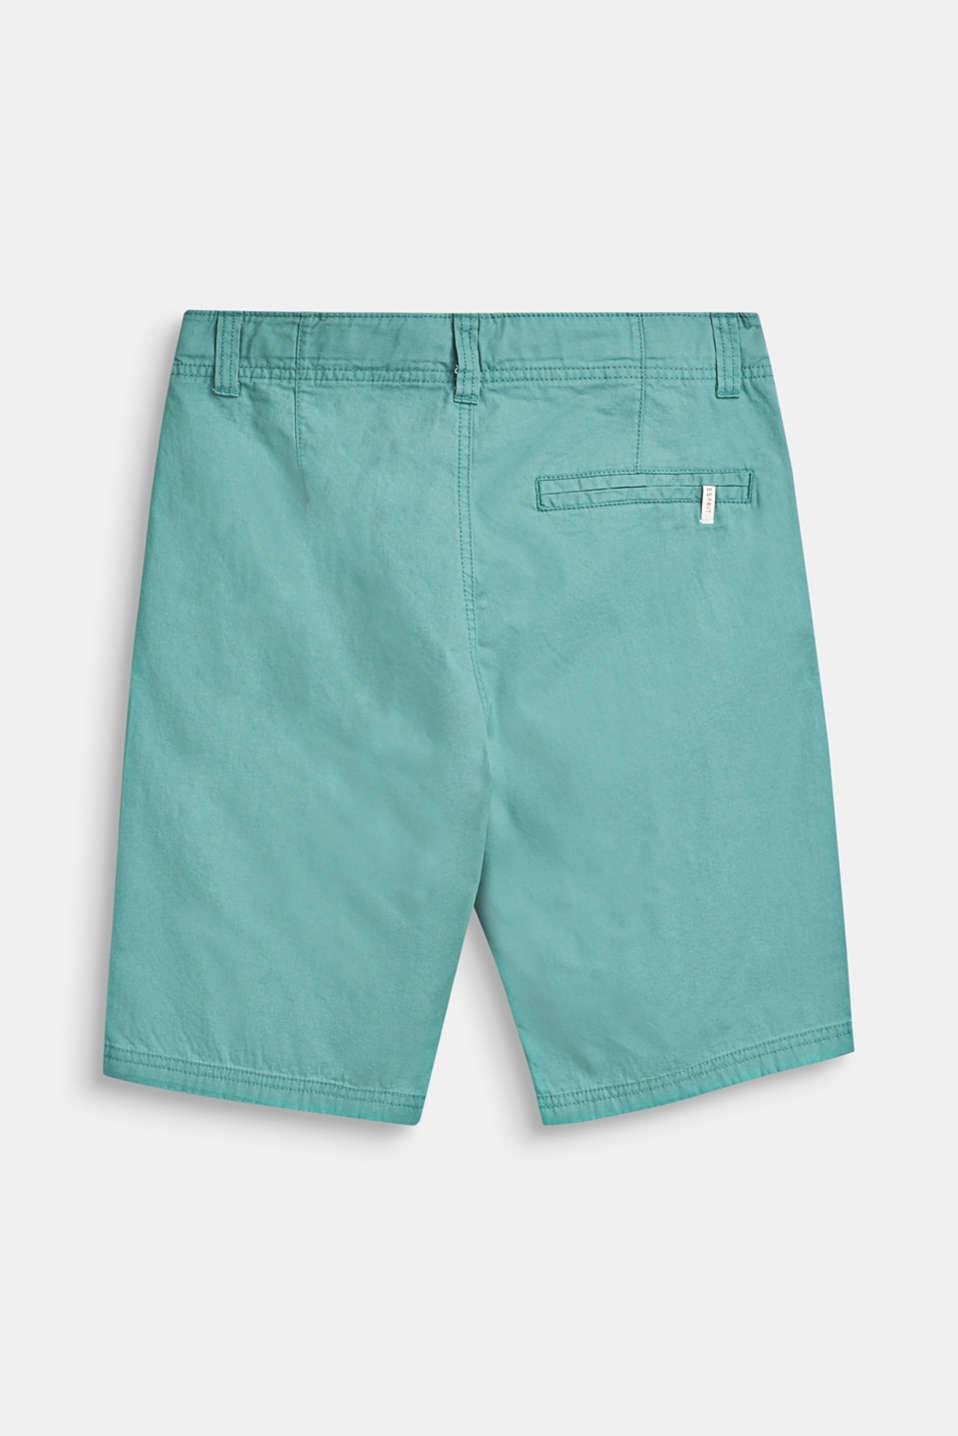 Bermuda shorts in 100% cotton, LCSOFT GREEN, detail image number 1